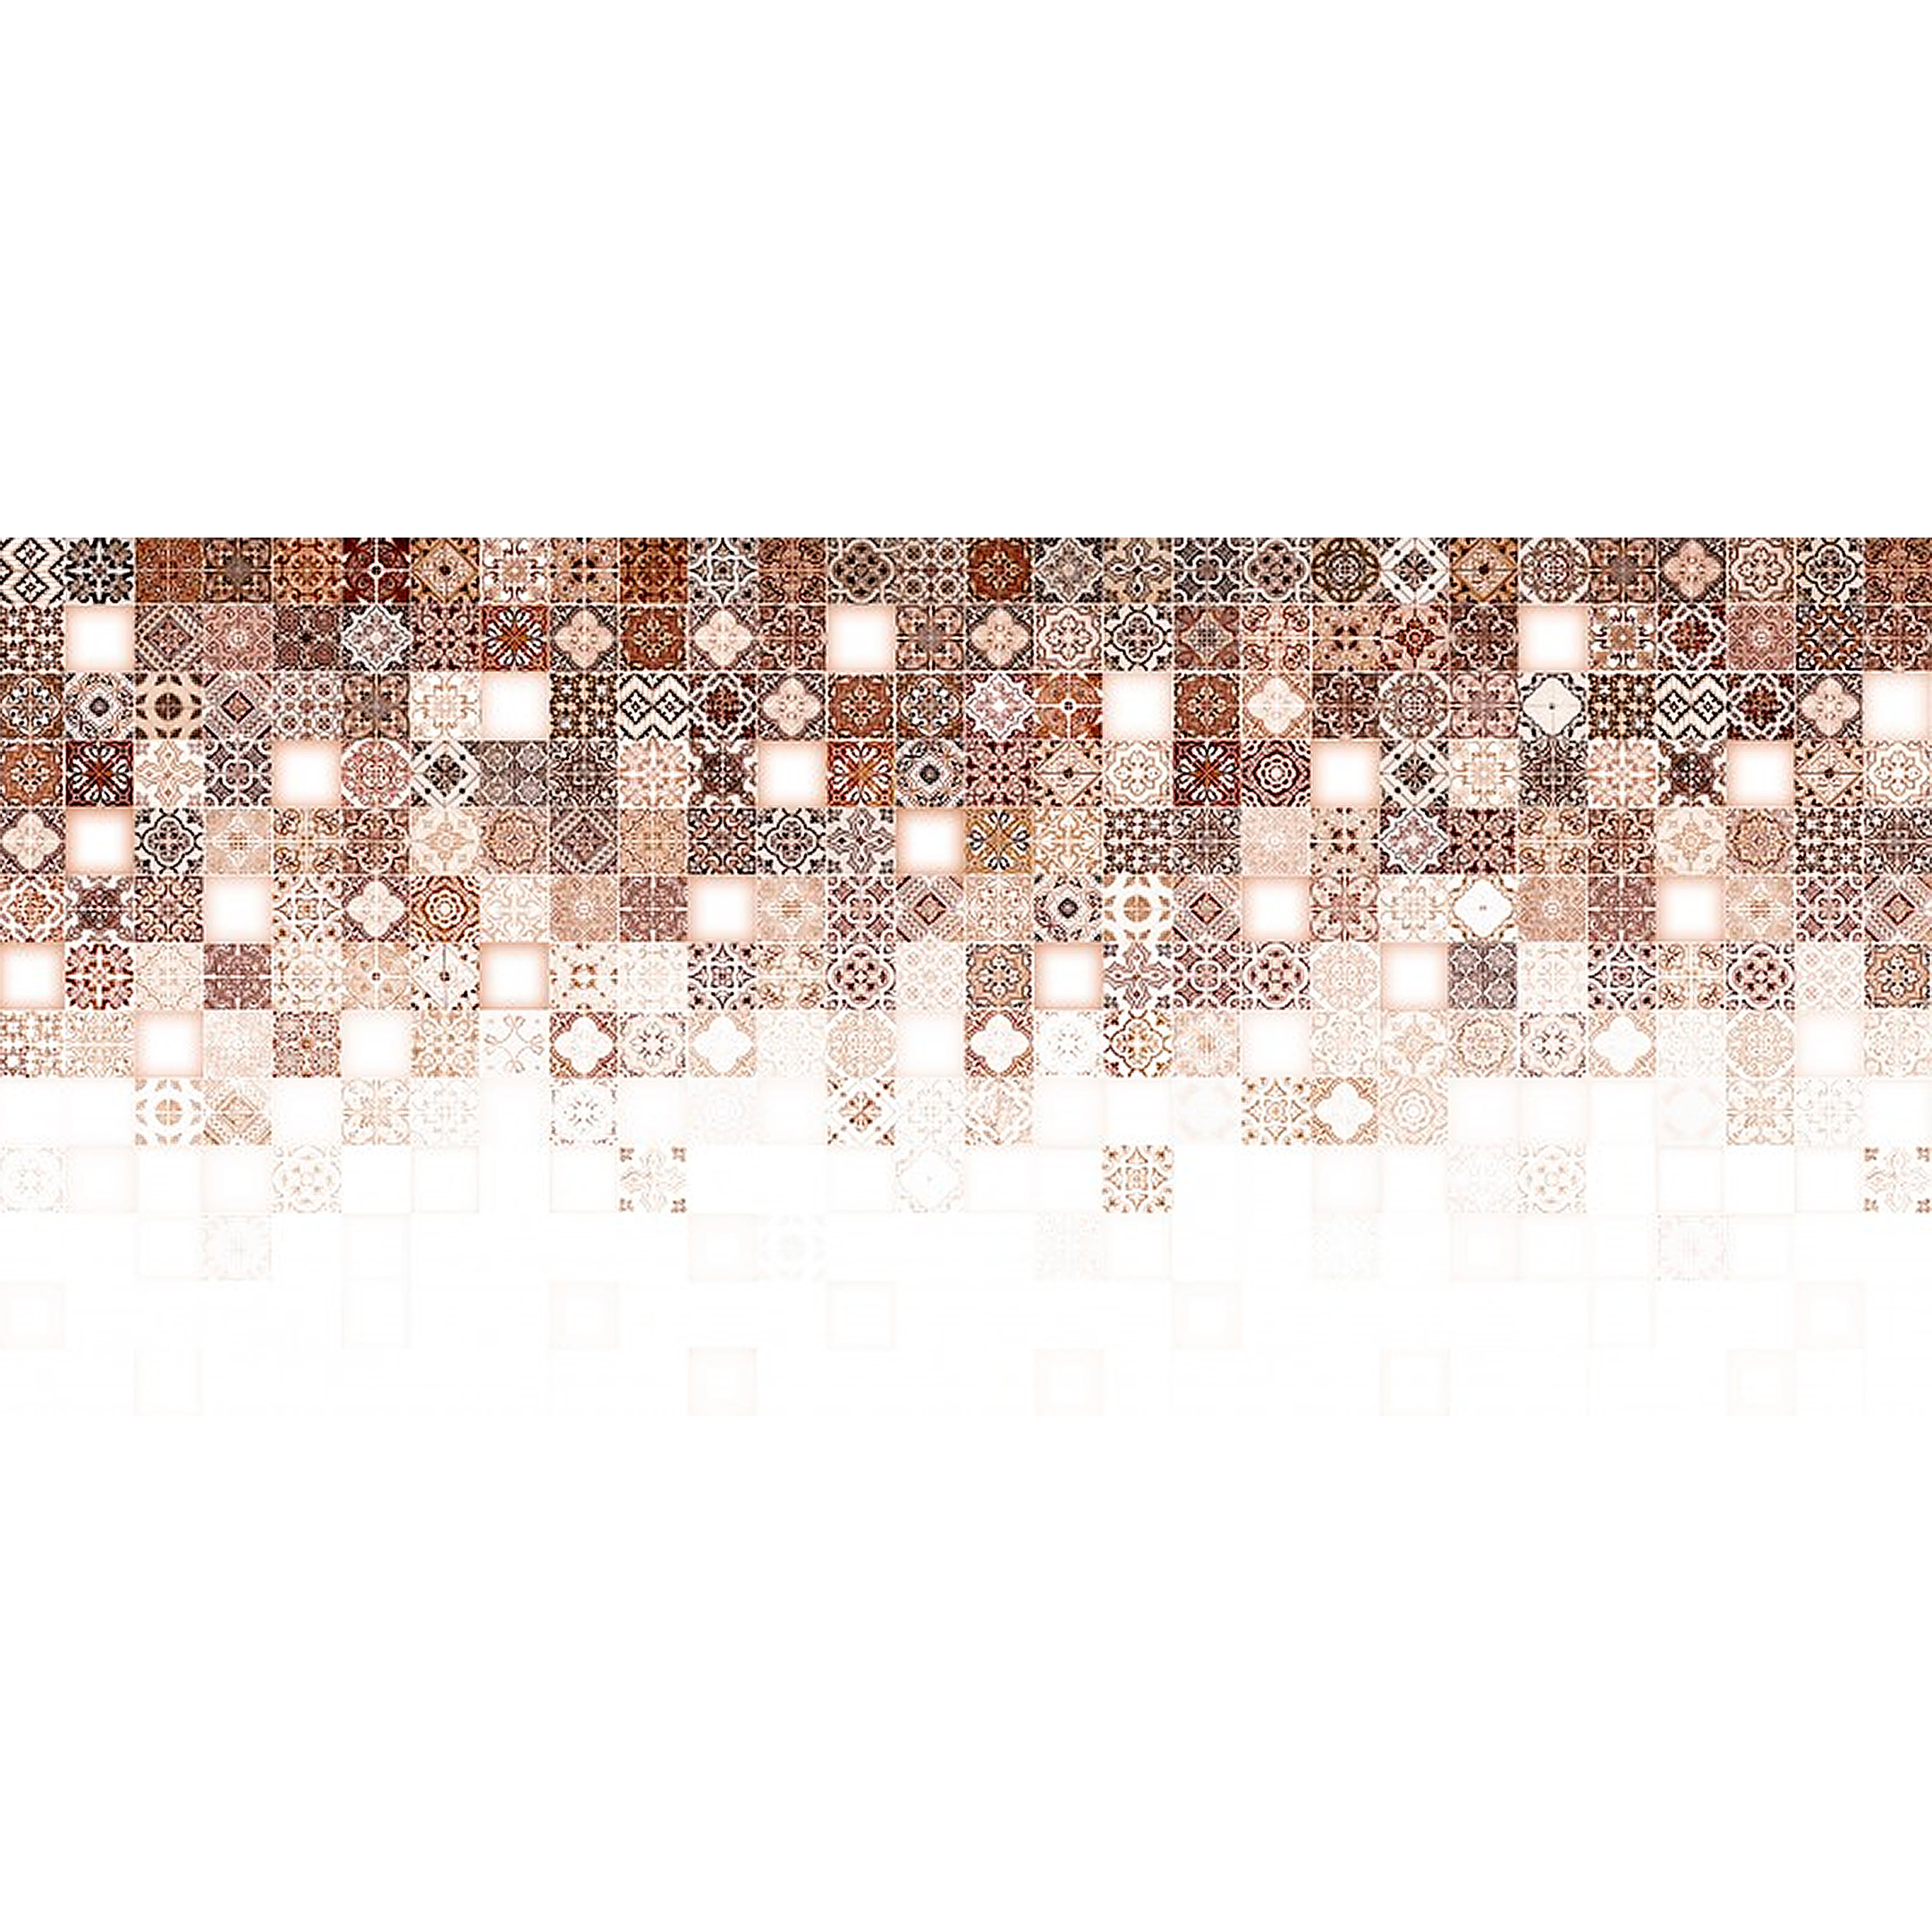 цена на Плитка облицовочная Cersanit Hammam бежевый 200x440x8,5 мм (12 шт.=1,05 кв.м)